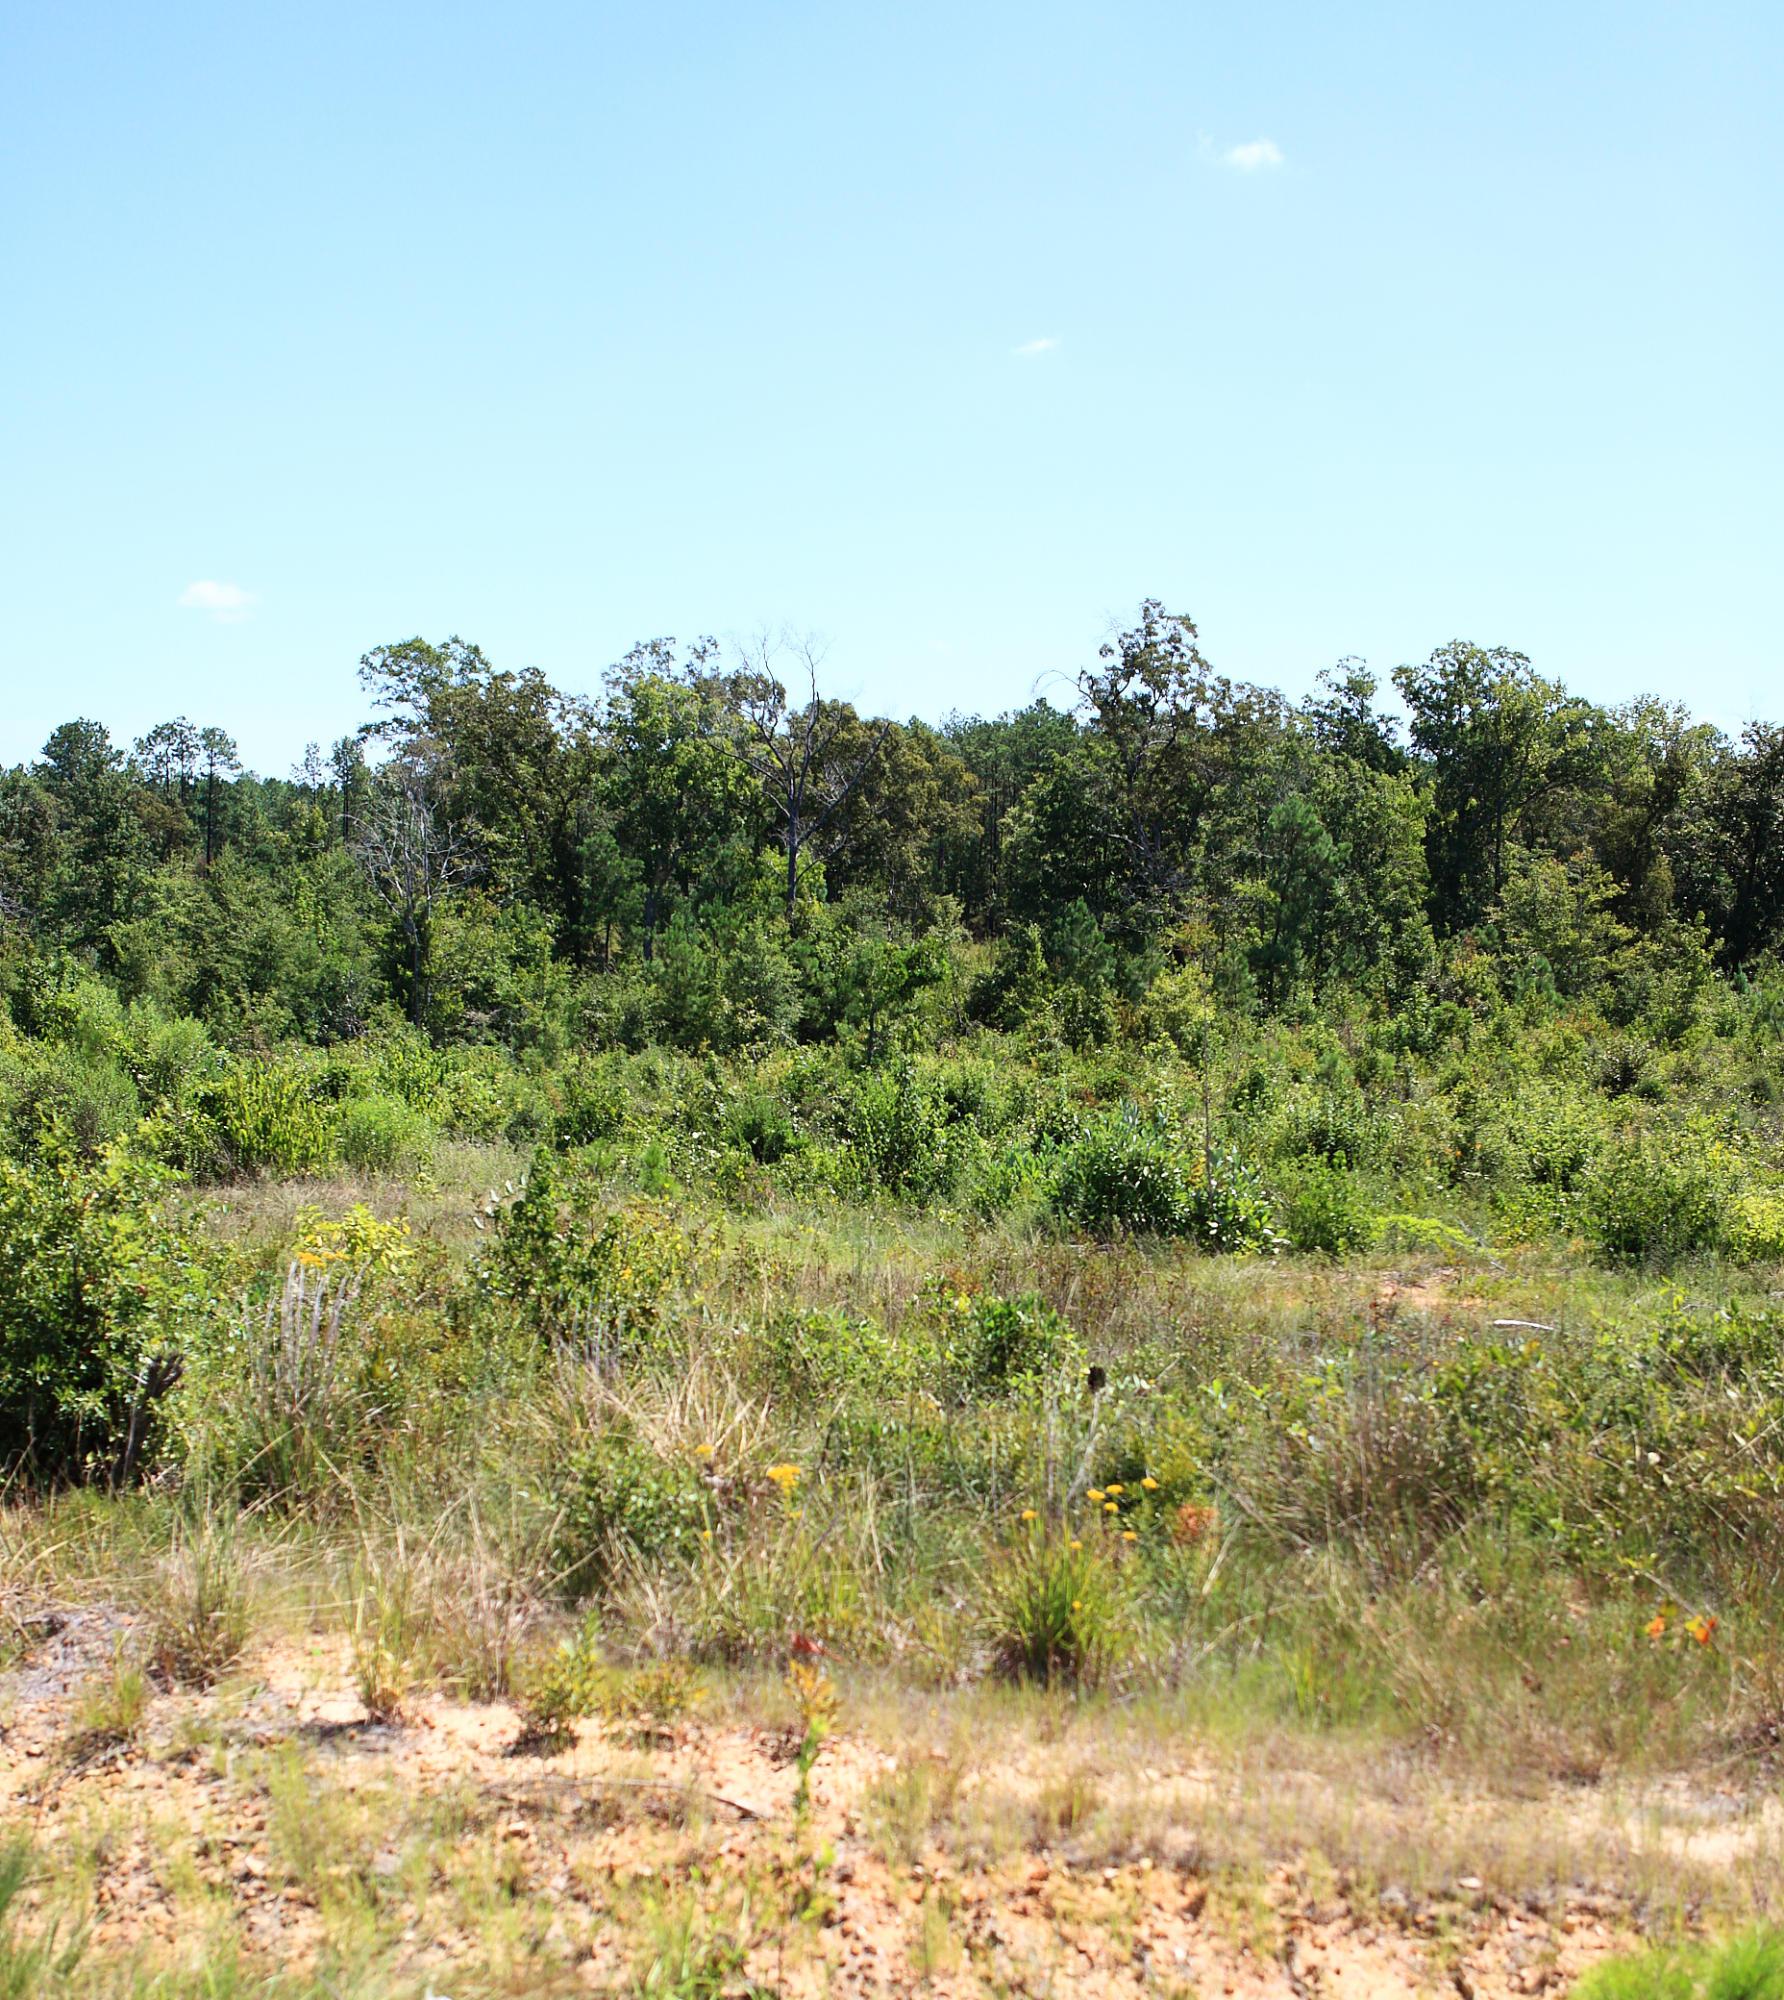 Leesville land for sale,  Lot 21 LeBleu Settlement, Leesville LA - $16,500